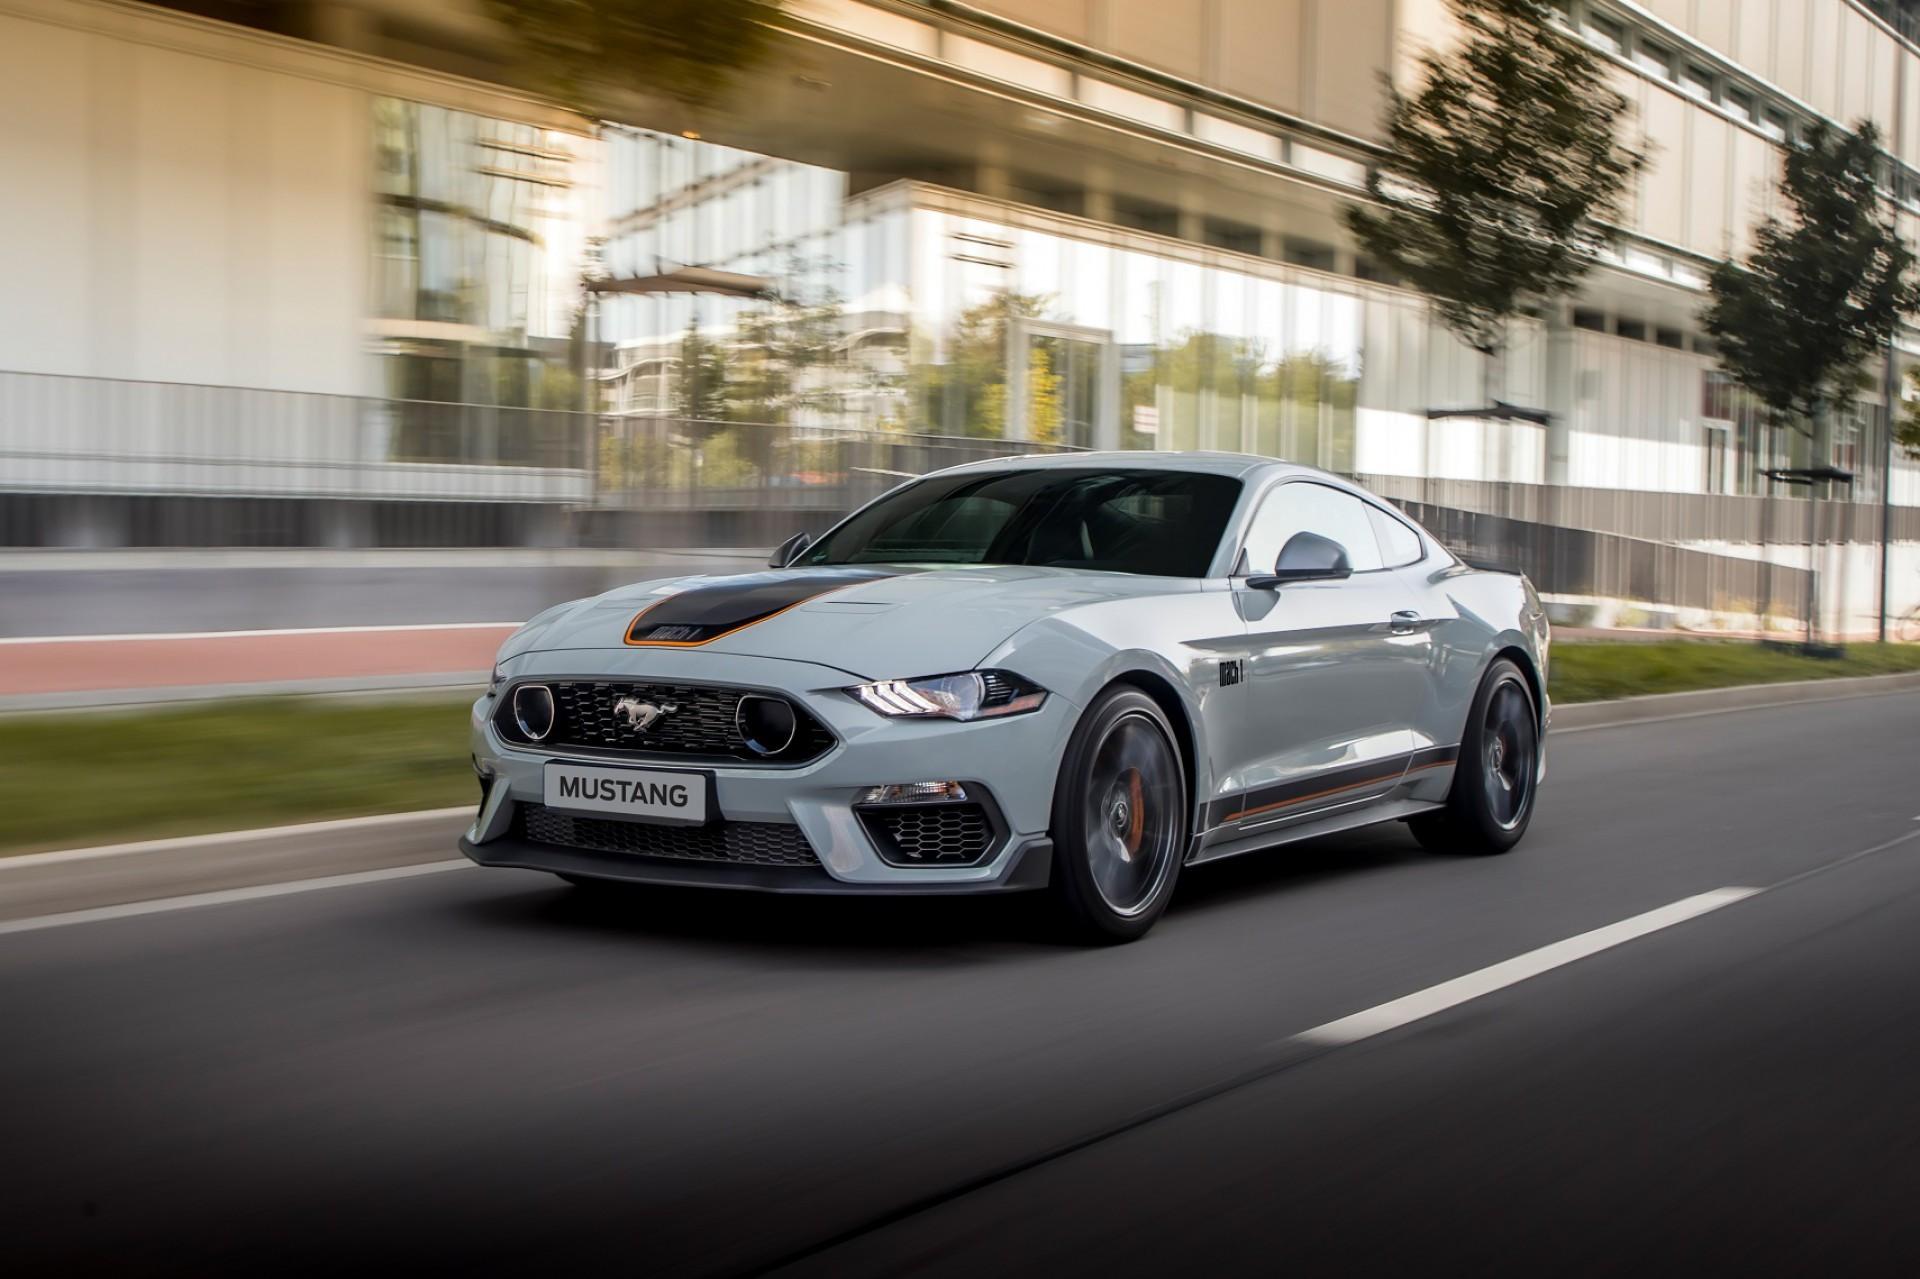 Ford lança o Mustang Mach 1 por R$ 499 mil